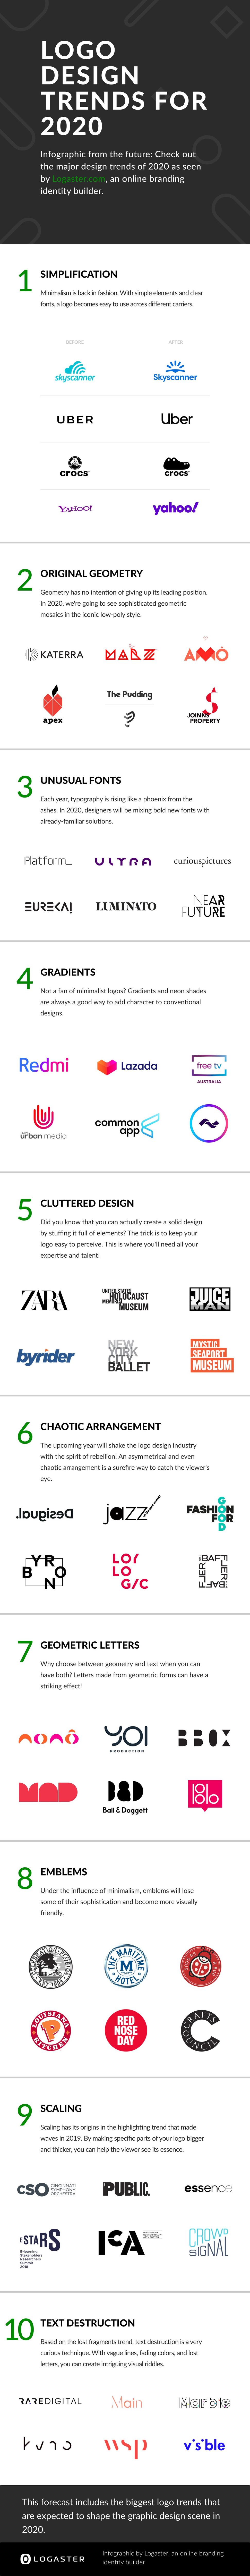 "Logo Trends 2020 ""width ="" 1510 ""style ="" width: 1510px; ""srcset ="" https://blog.hubspot.com/hs-fs/hubfs/Logo%20Trends%202020%20.png?width=755&name= Logo% 20Trends% 202020% 20.png 755w, https://blog.hubspot.com/hs-fs/hubfs/Logo%20Trends%202020%20.png?width=1510&name=Logo%20Trends%202020%20.png 1510w, https://blog.hubspot.com/hs-fs/hubfs/Logo%20Trends%202020%20.png?width=2265&name=Logo%20Trends%202020%20.png 2265w, https: //blog.hubspot .com / hs-fs / hubfs / Logo% 20Trends% 202020% 20.png? larghezza = 3020 e nome = Logo% 20Trends% 202020% 20.png 3020w, https://blog.hubspot.com/hs-fs/hubfs/ Logo% 20Trends% 202020% 20.png? Larghezza = 3775 e nome = Logo% 20Trends% 202020% 20.png 3775w, https://blog.hubspot.com/hs-fs/hubfs/Logo%20Trends%202020%20.png ? larghezza = 4530 e nome = Logo% 20Trends% 202020% 20.png 4530w ""dimensioni ="" (larghezza massima: 1510px) 100vw, 1510px"